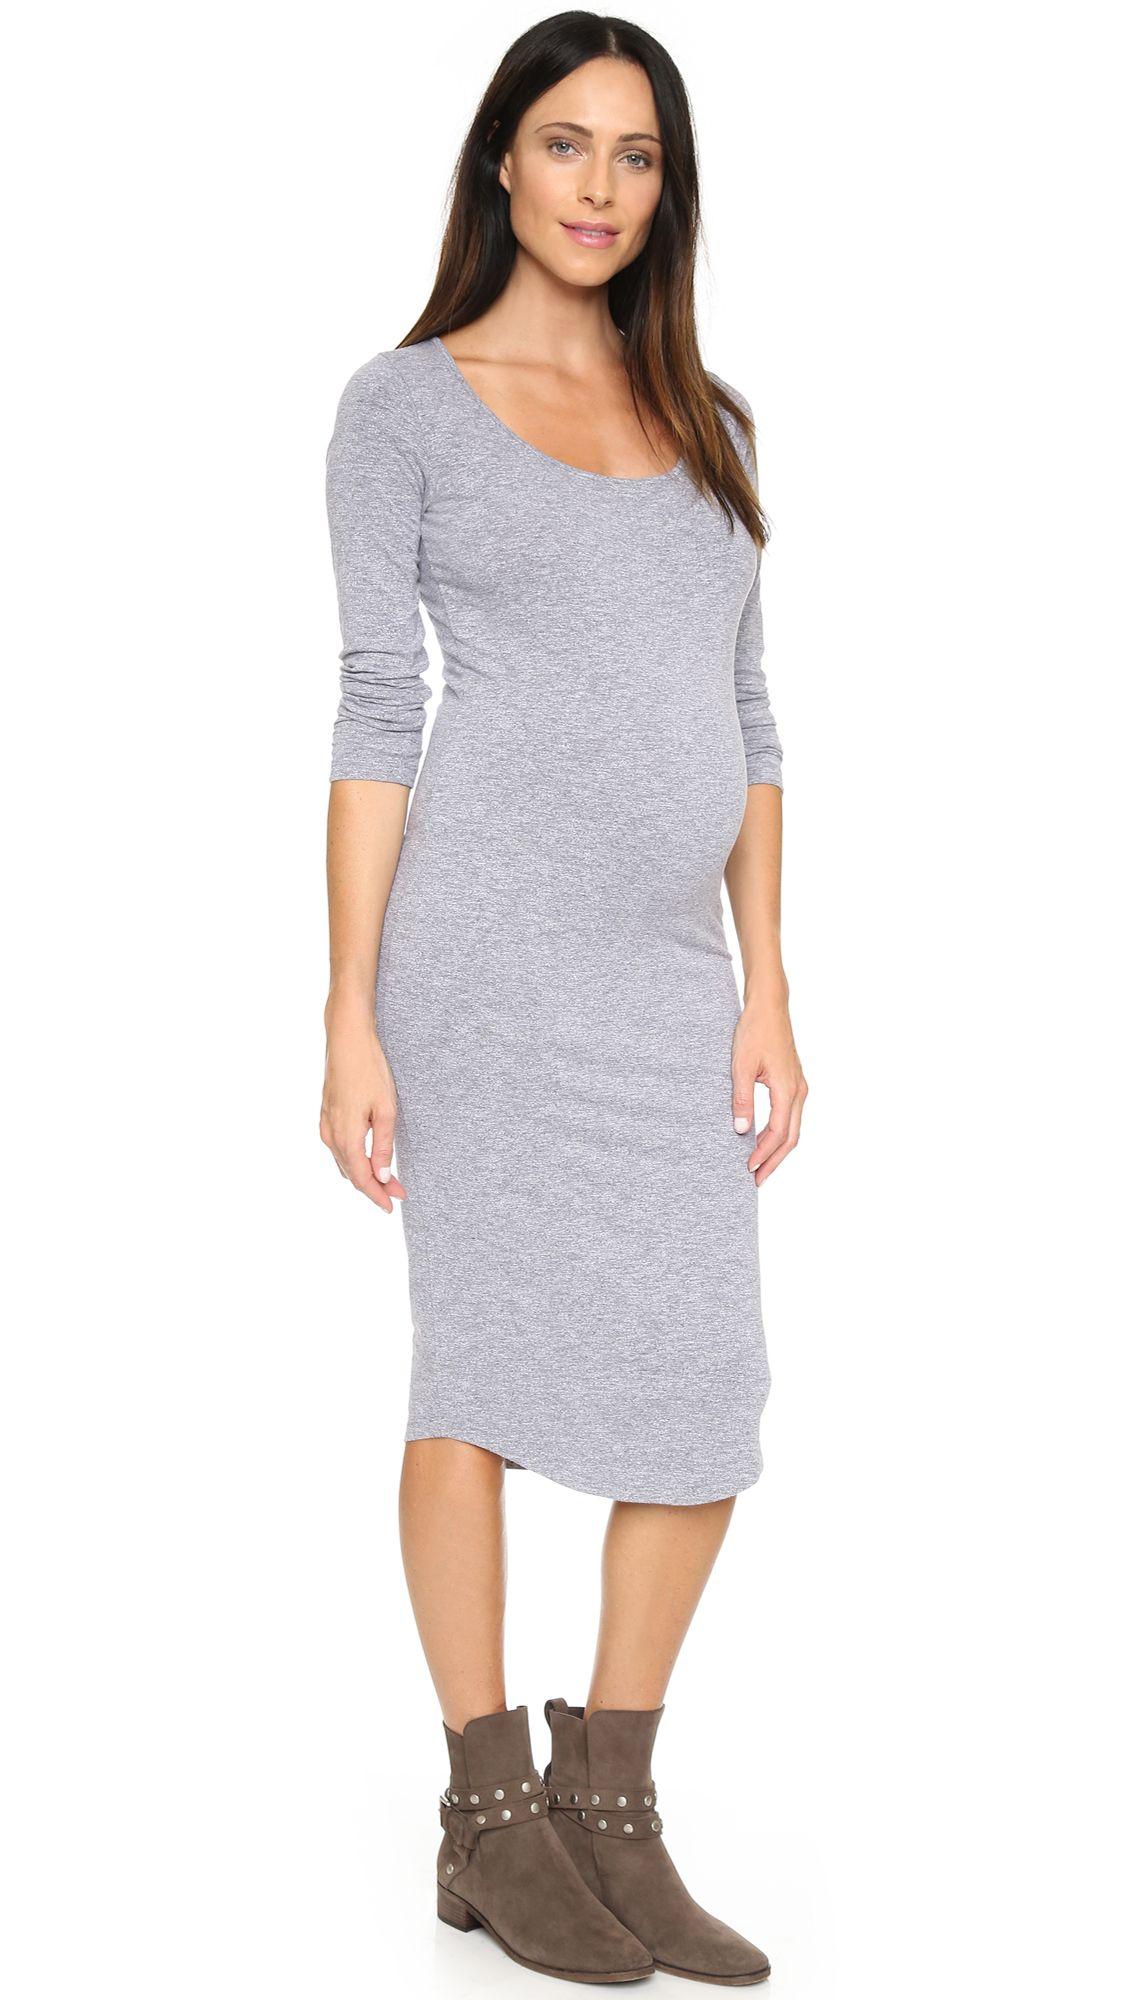 05af976b37e Monrow Maternity Long Sleeve Dress - Granite by  MONROW  Shopbop ...